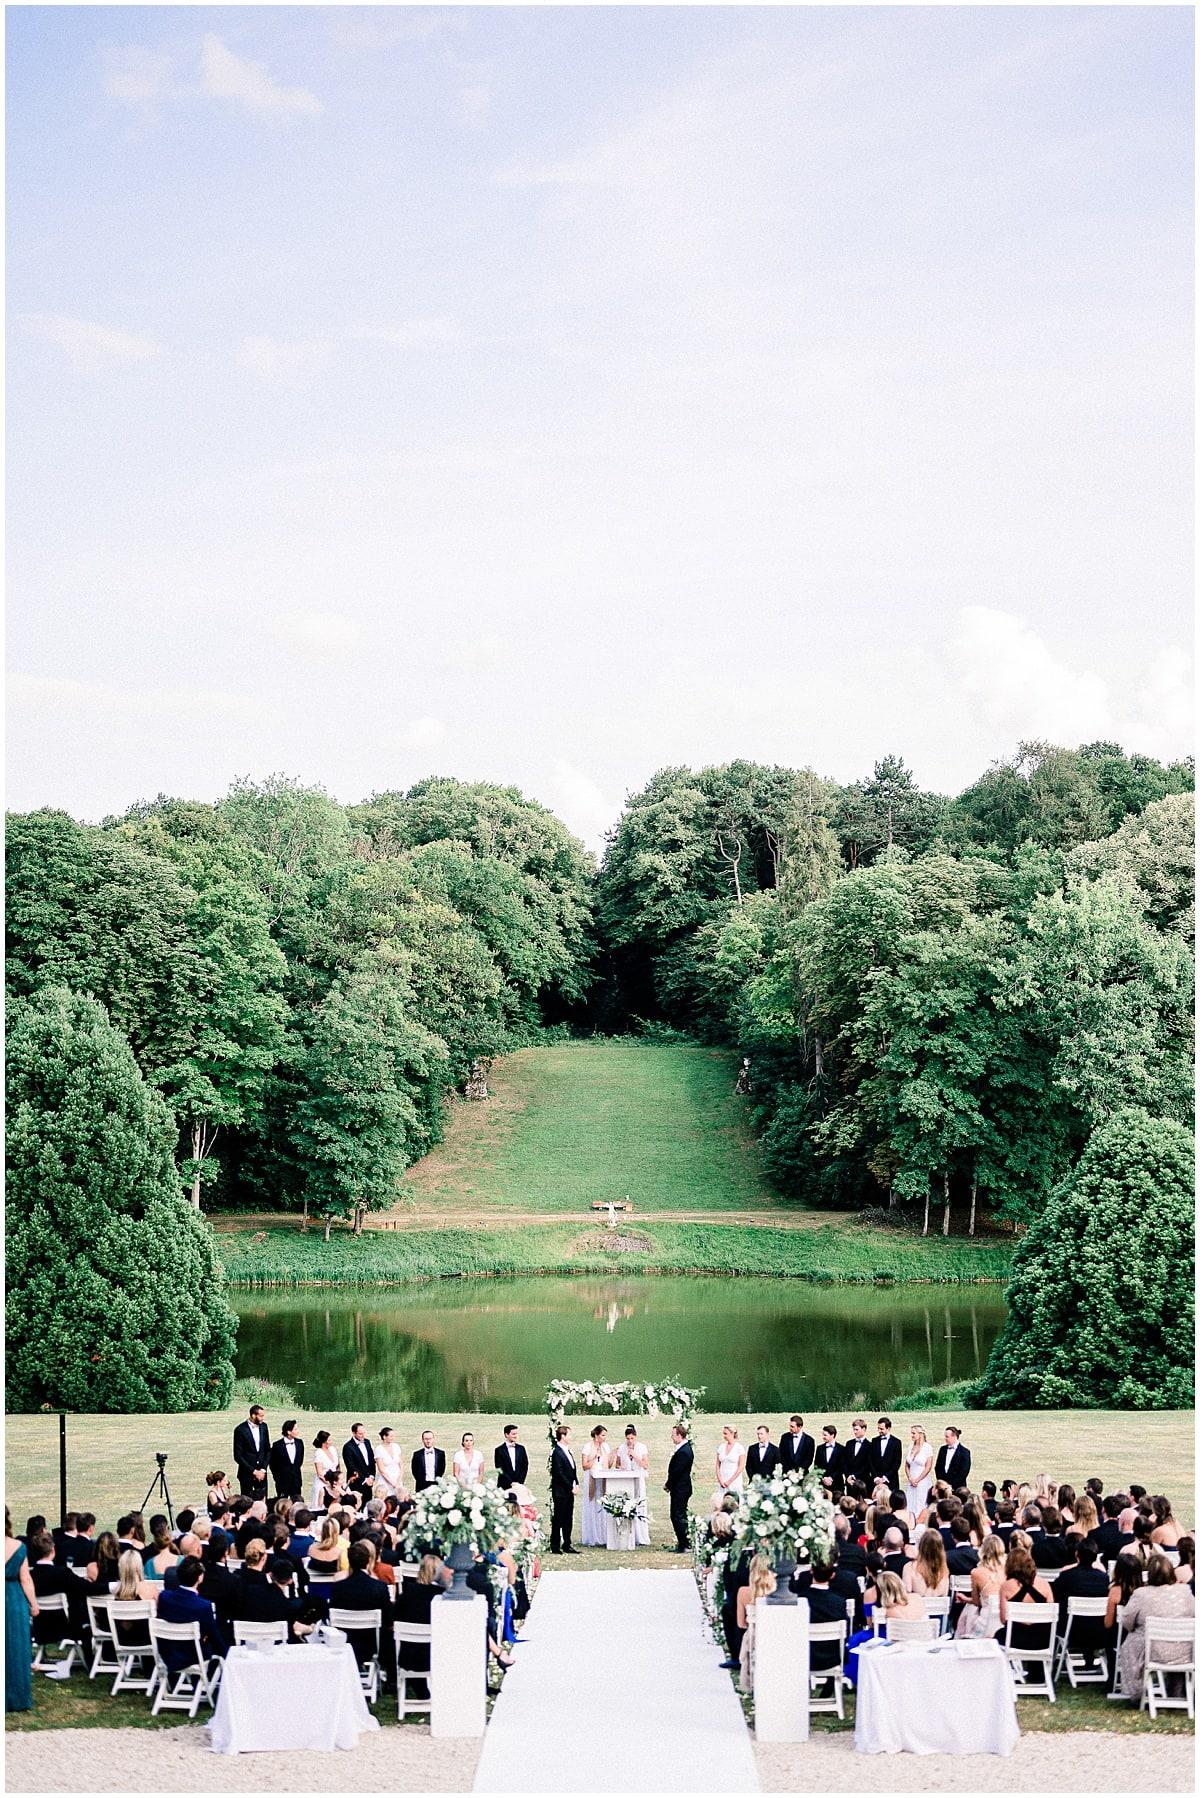 Gay chateau baronville paris destination wedding fineart